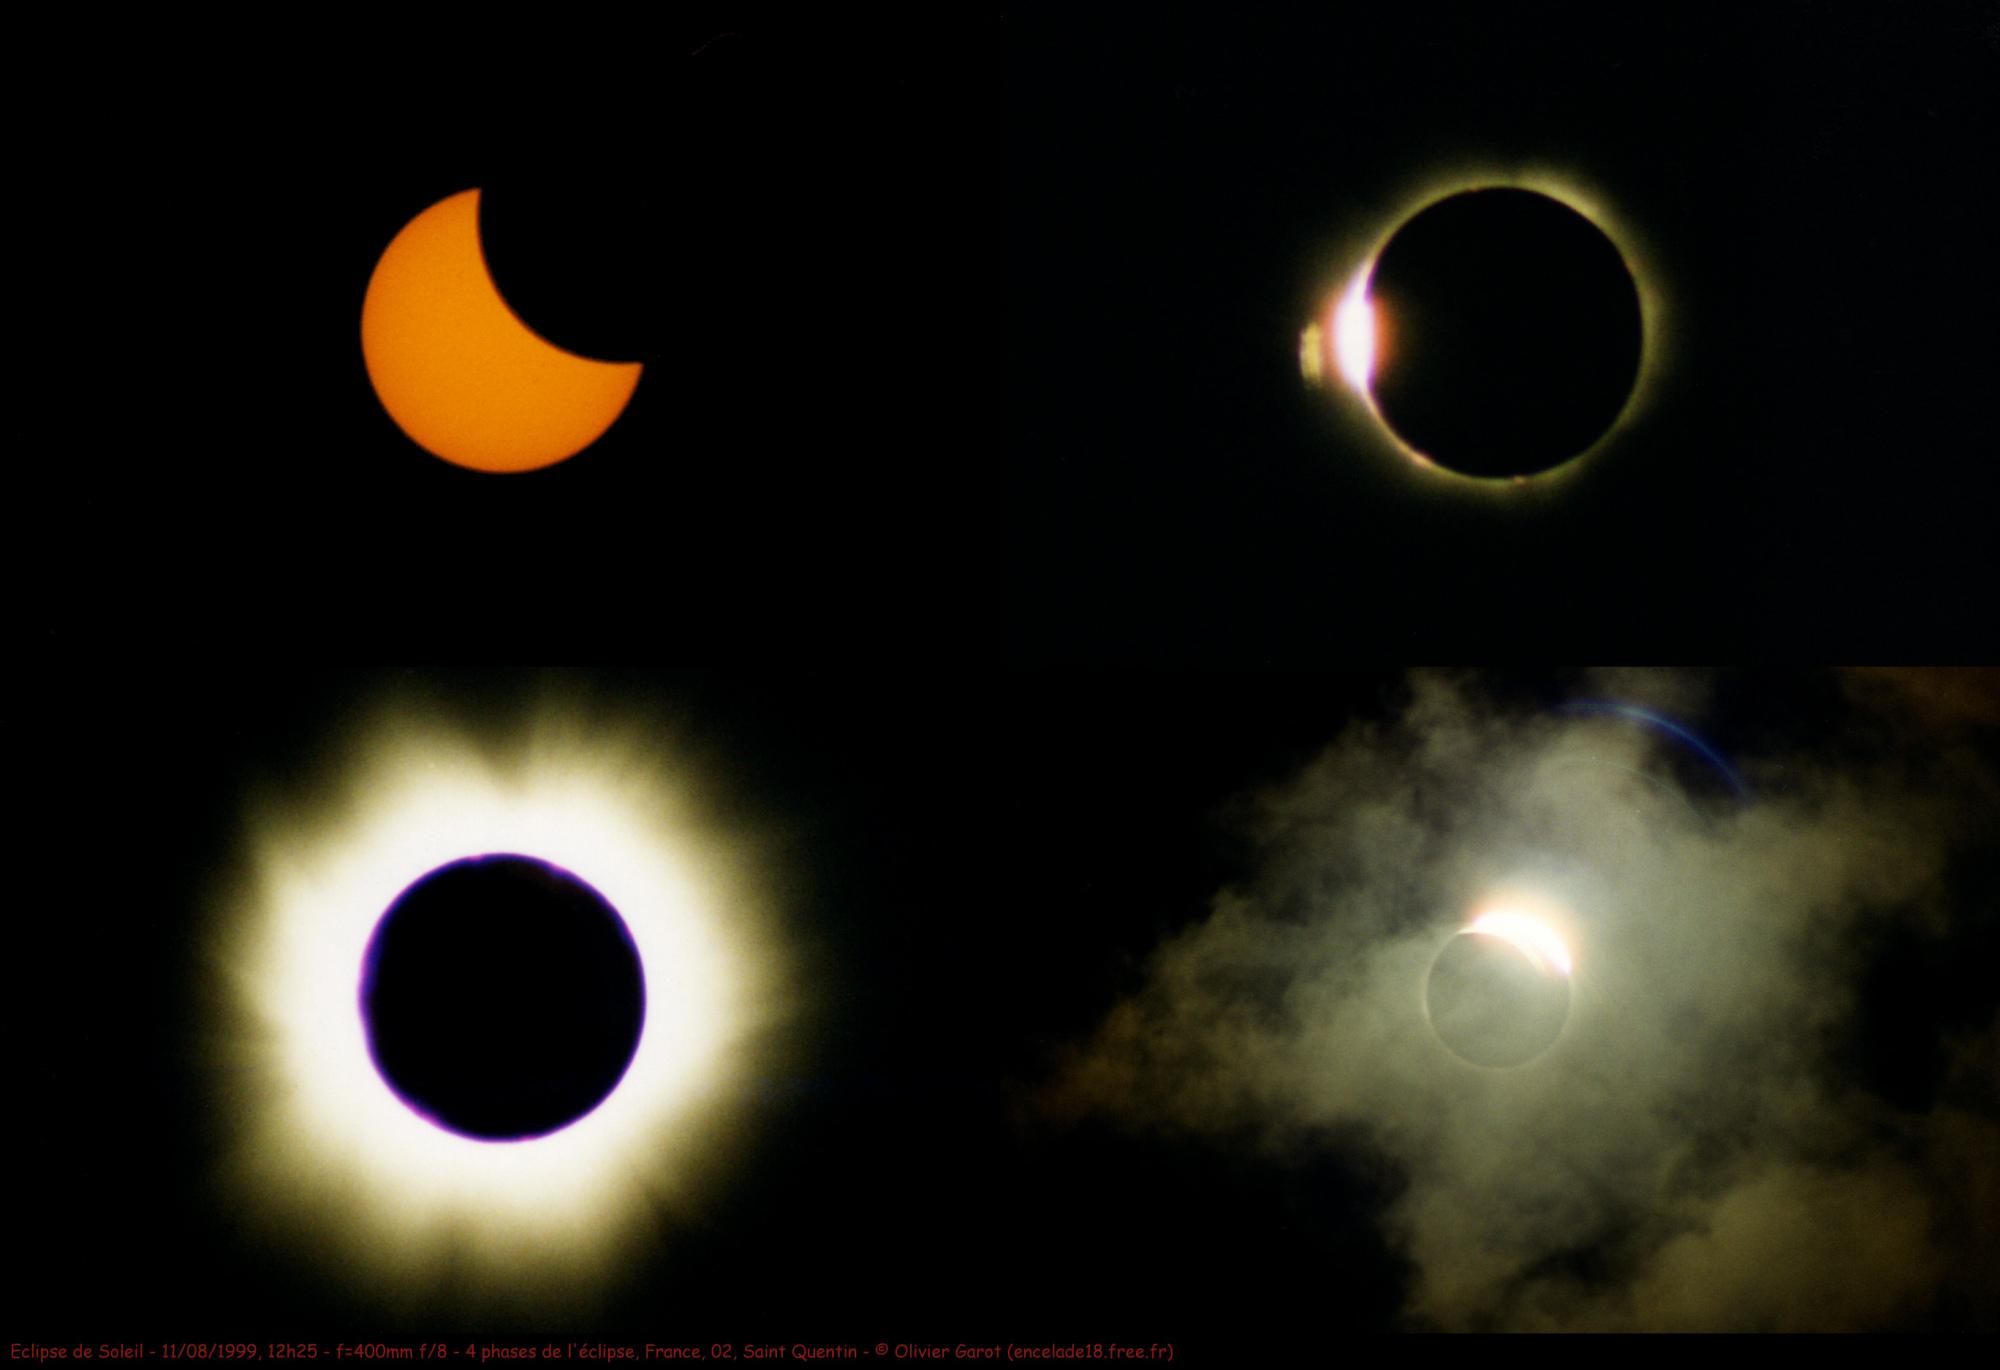 Soleil_1999_08_11_Eclipse_02_05_06_11_XRX_400mmB2_og.thumb.jpg.7926697cc35d014b1776d932a59f568a.jpg